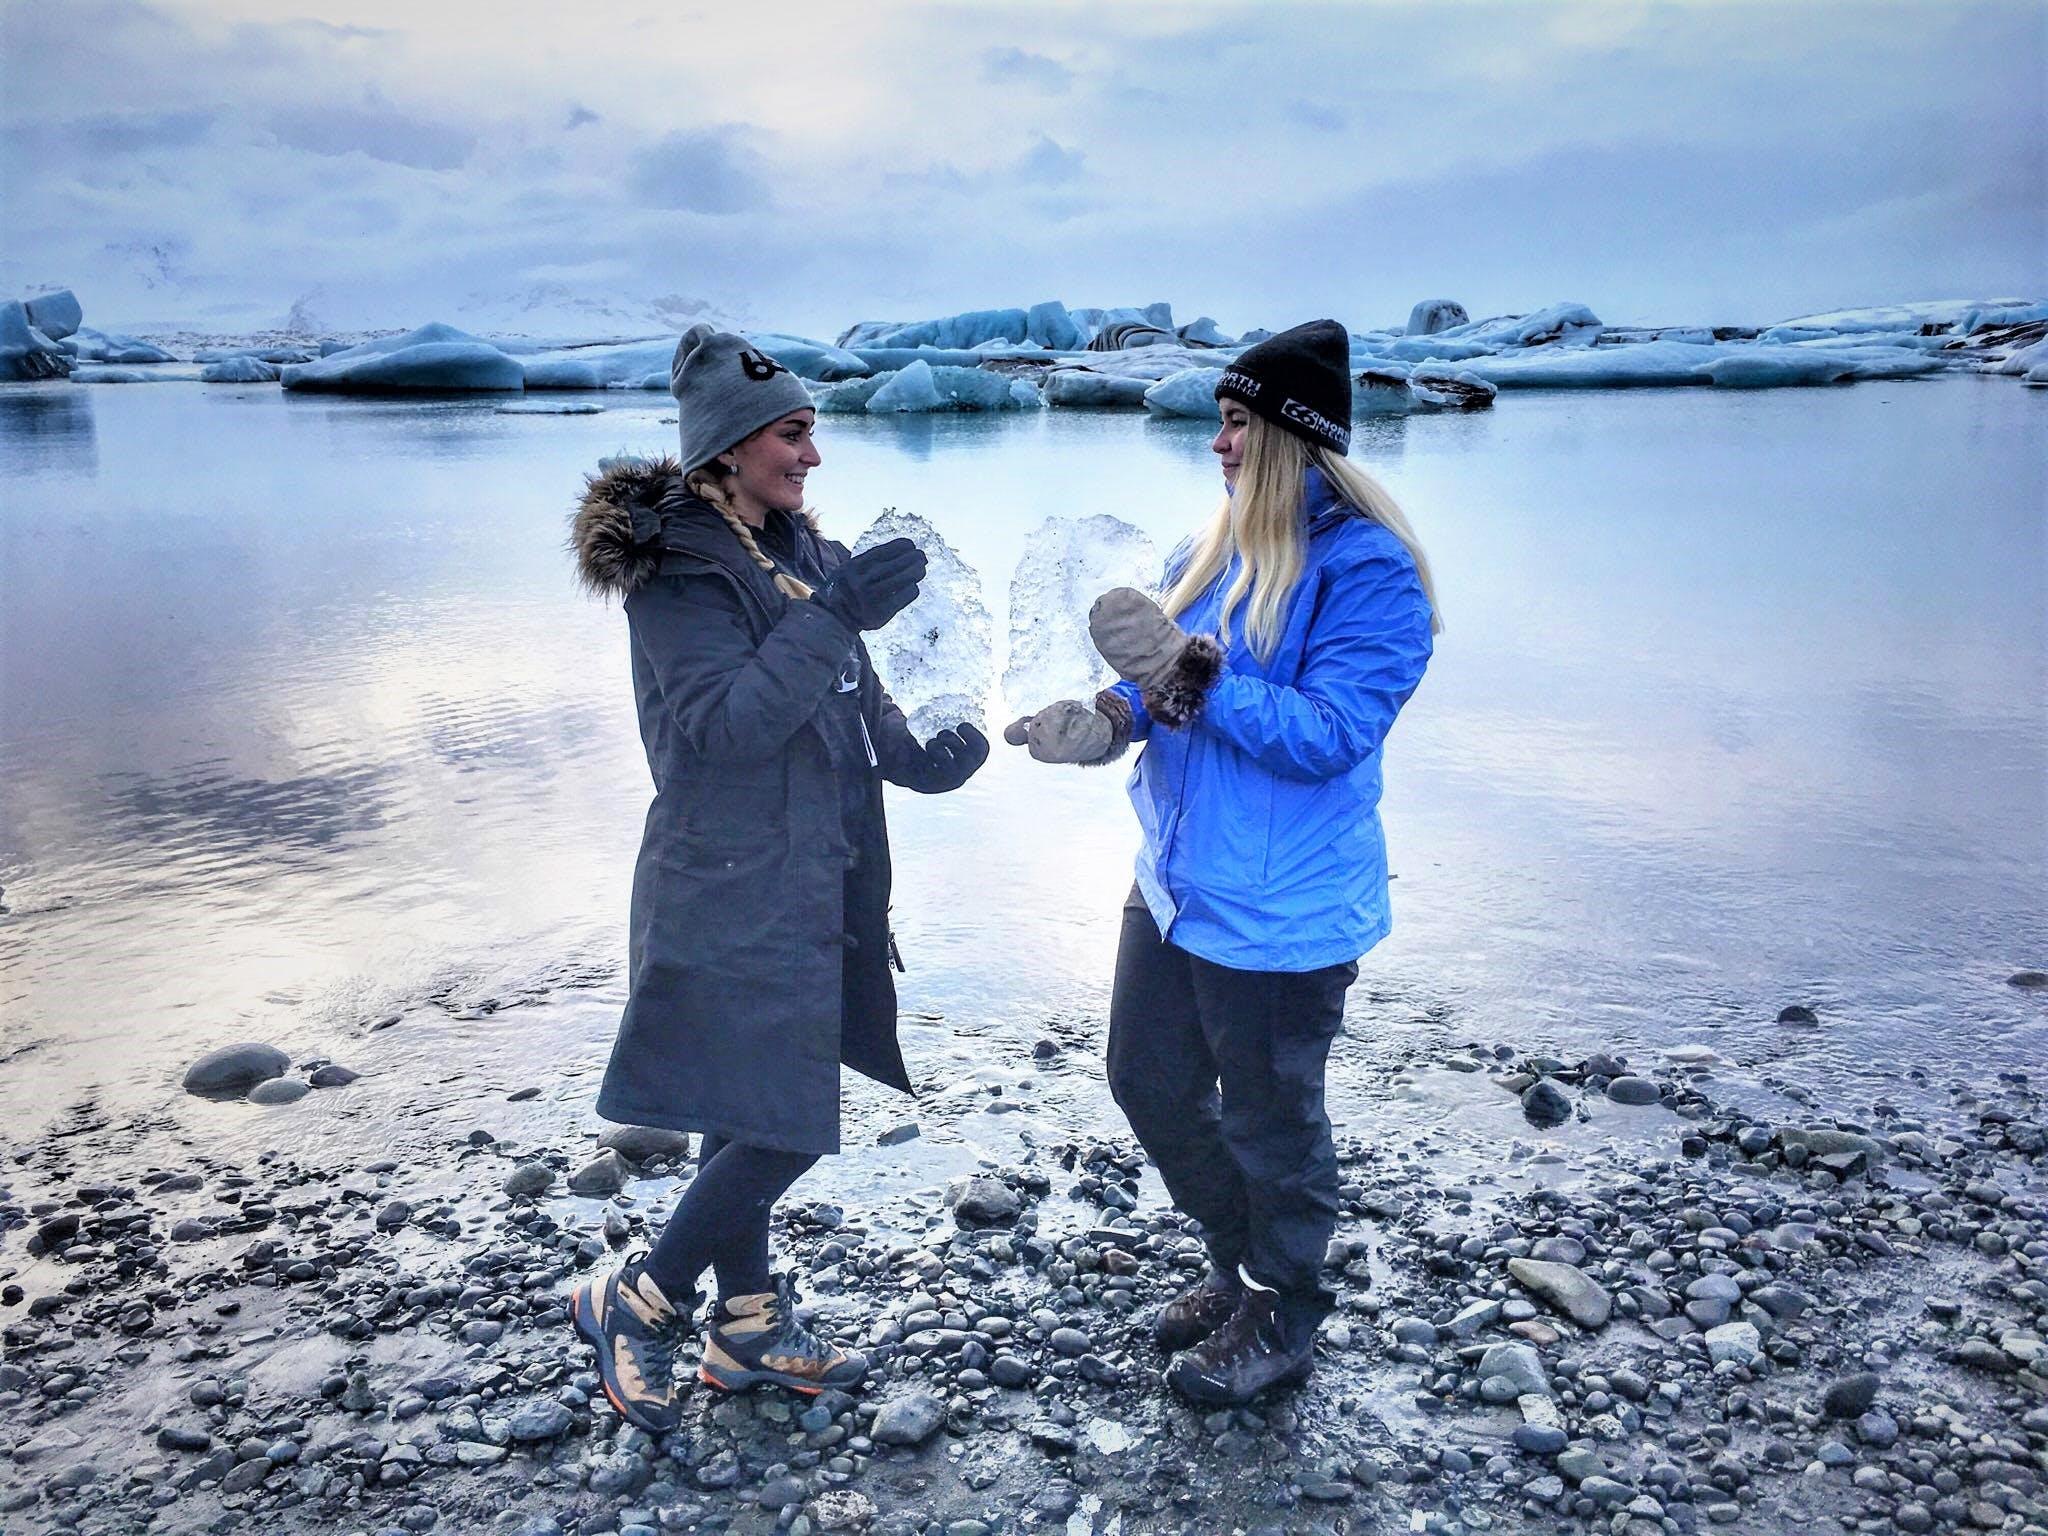 Small Group Vatnajokull Glacier Hike & Glacier Lagoon Tour From Reykjavik